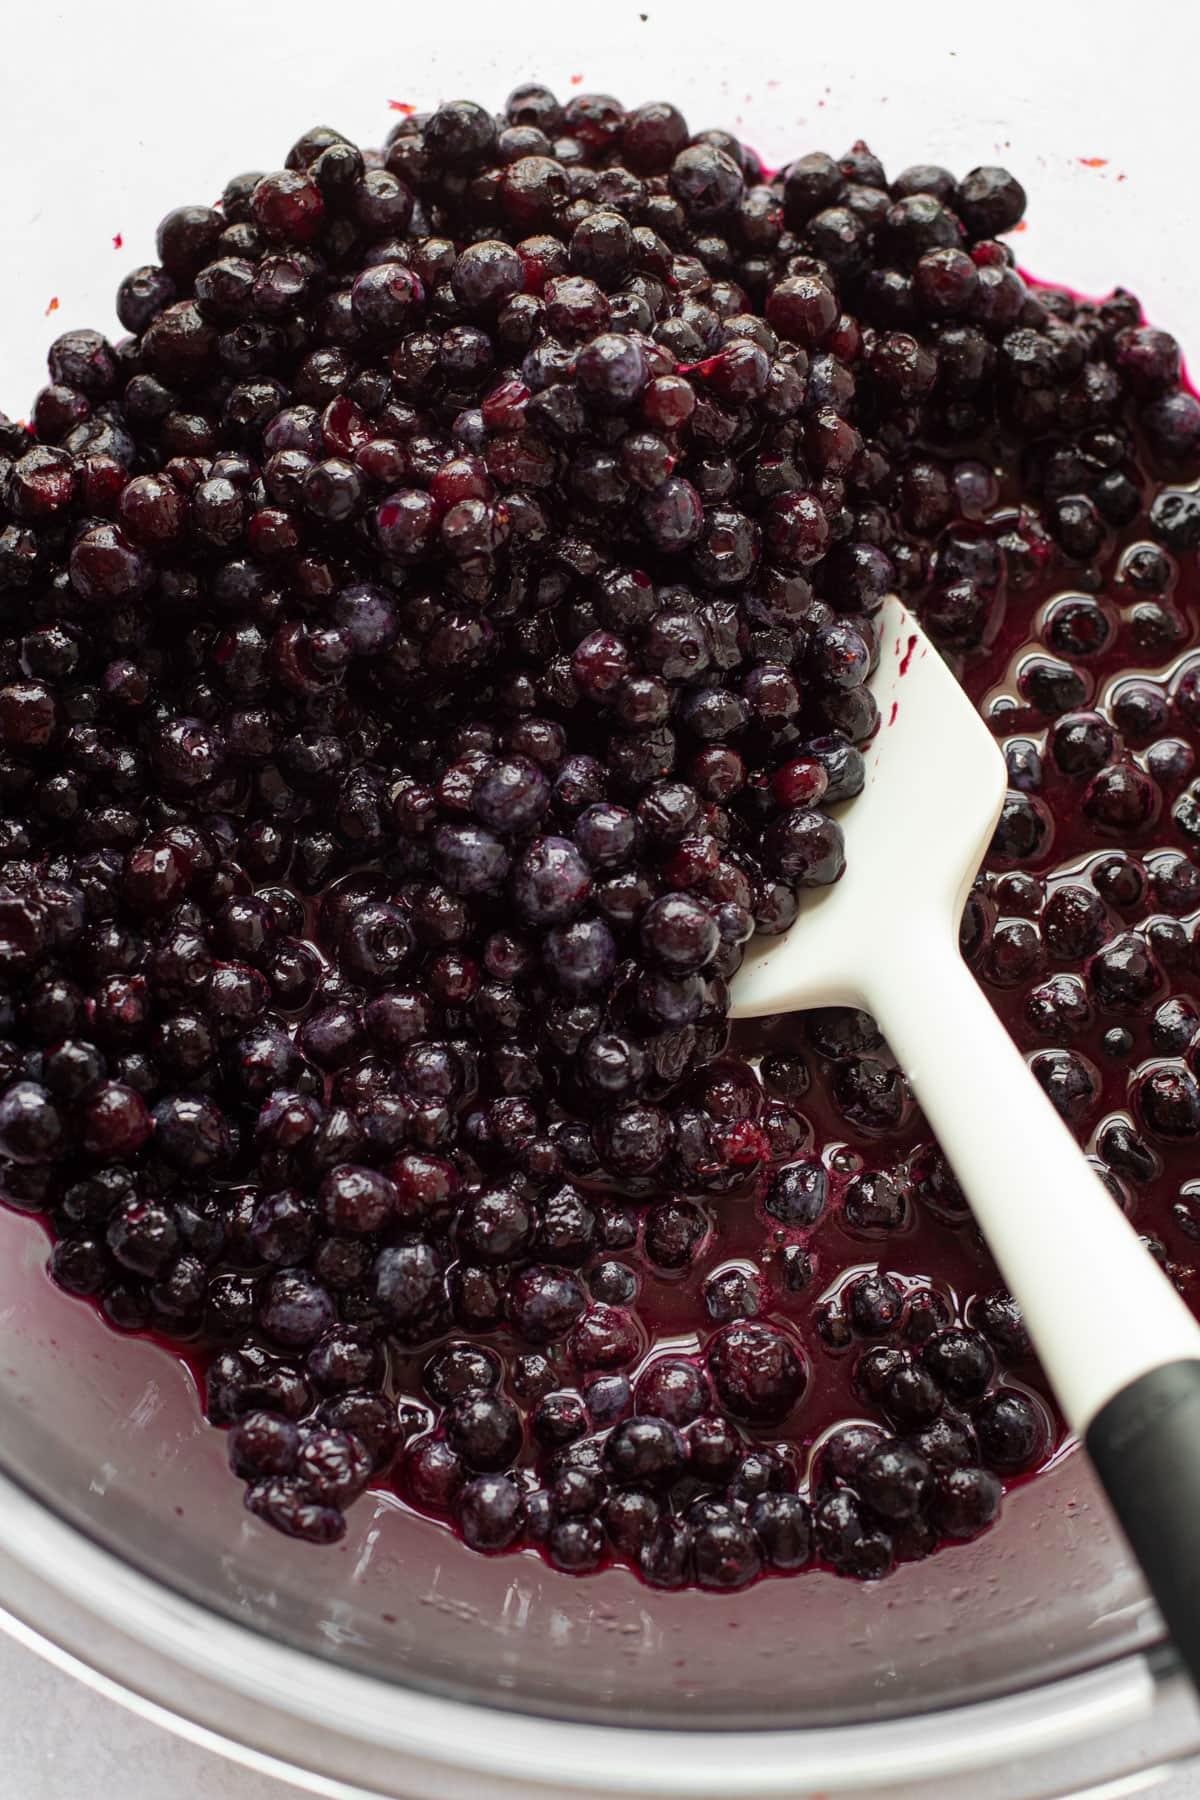 Wild blueberries being prepared to make blueberry pie filling.